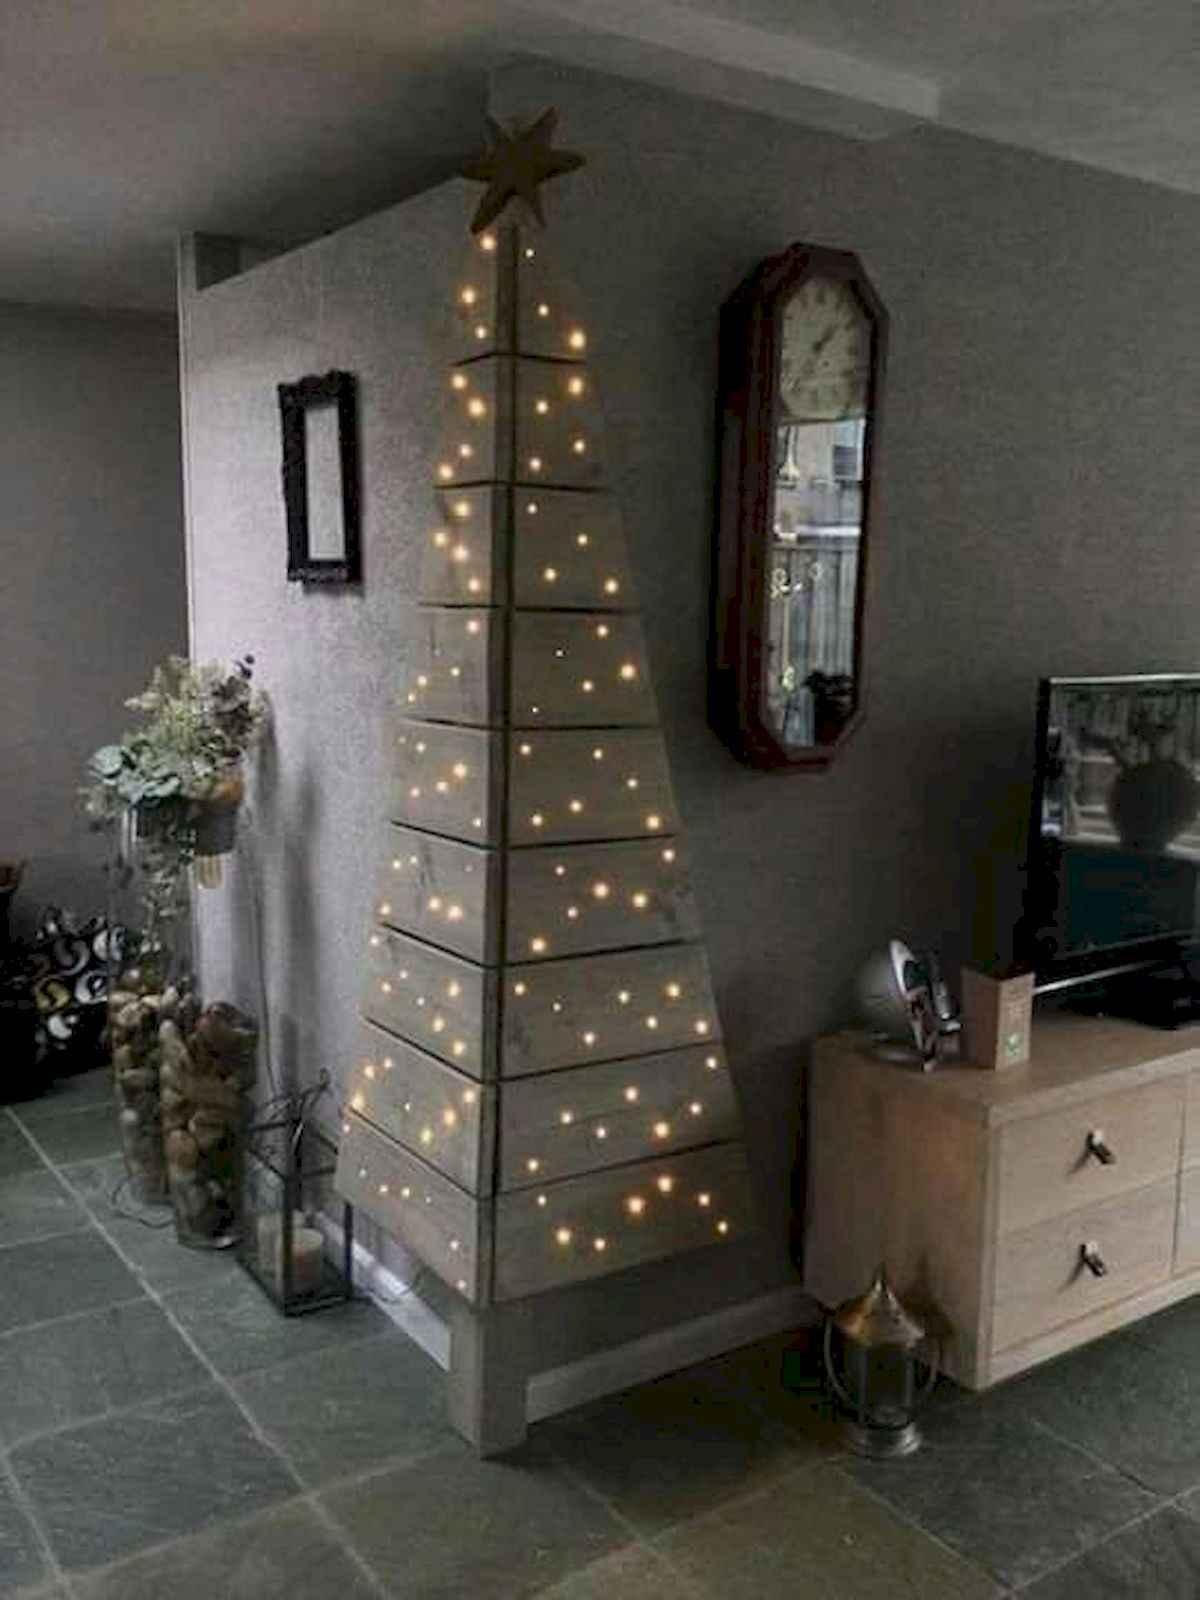 50 diy christmas decorations ideas (11)